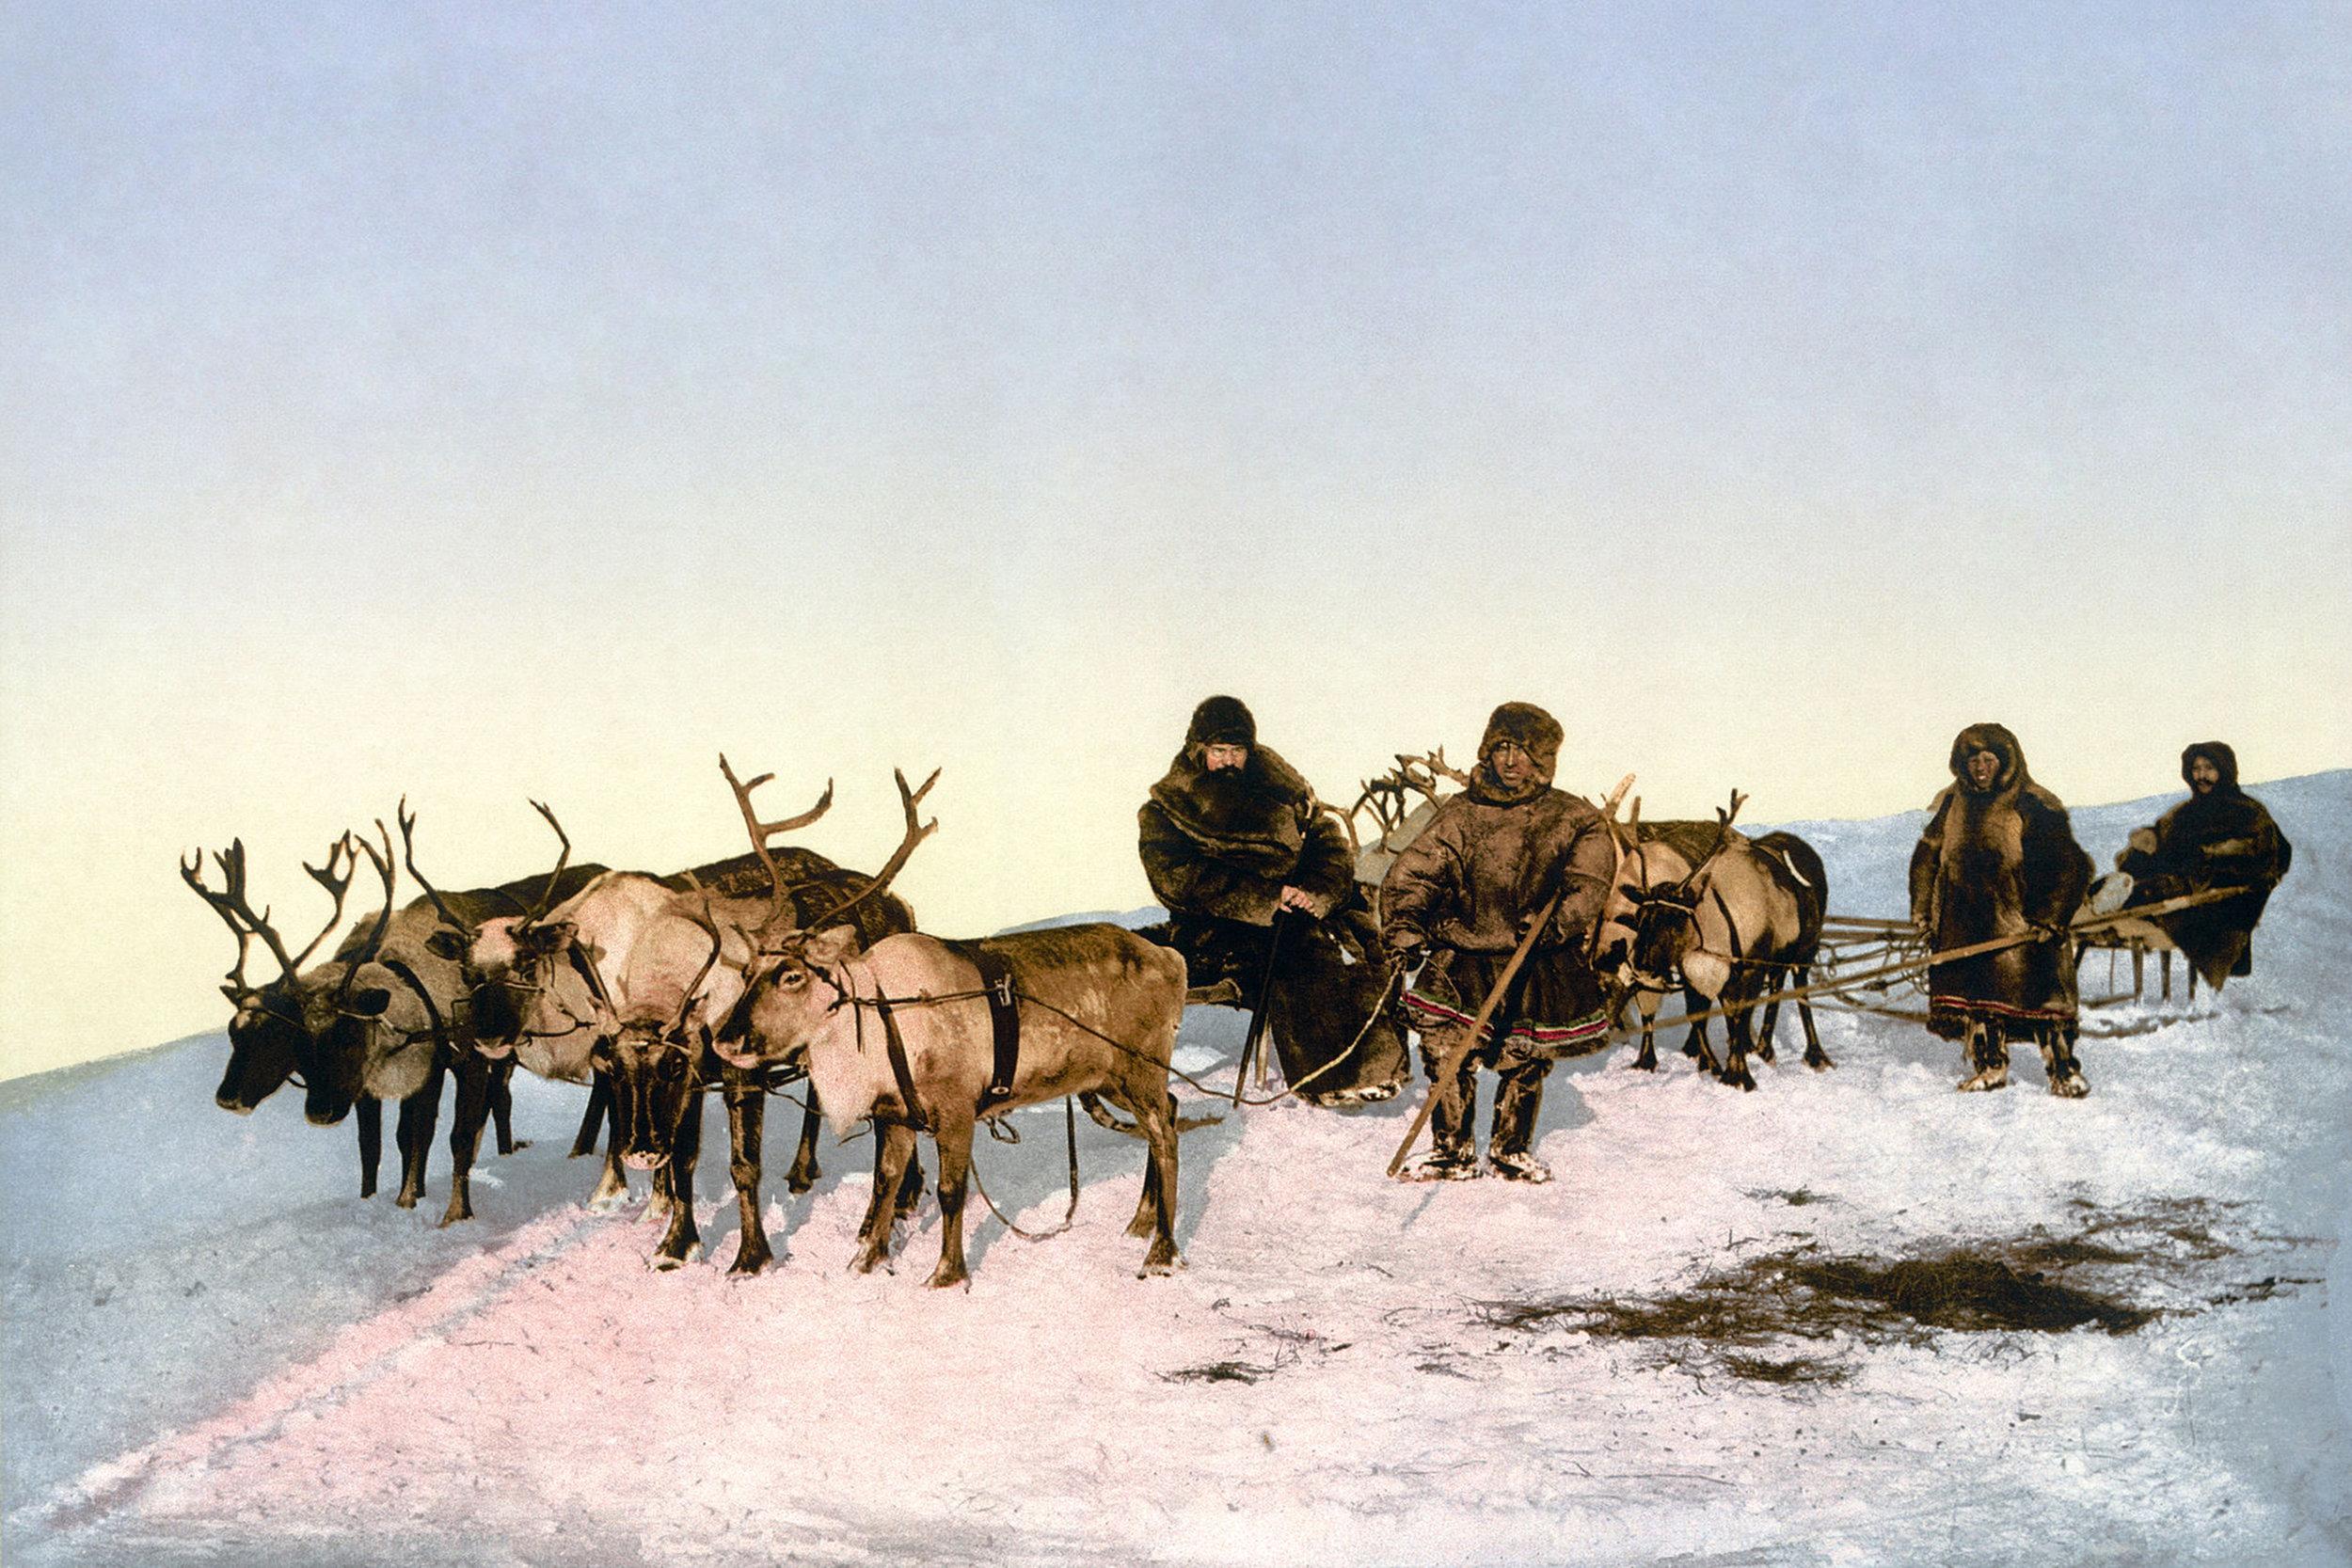 NENETSIA - ENDLESS TUNDRA AND FUR TEPEESSalekhard - Yar-Sale - Yamal Peninsula - Obdorsk8 DAYS - 3160 €Year-round departuresVIEW ITINERARY DETAILS